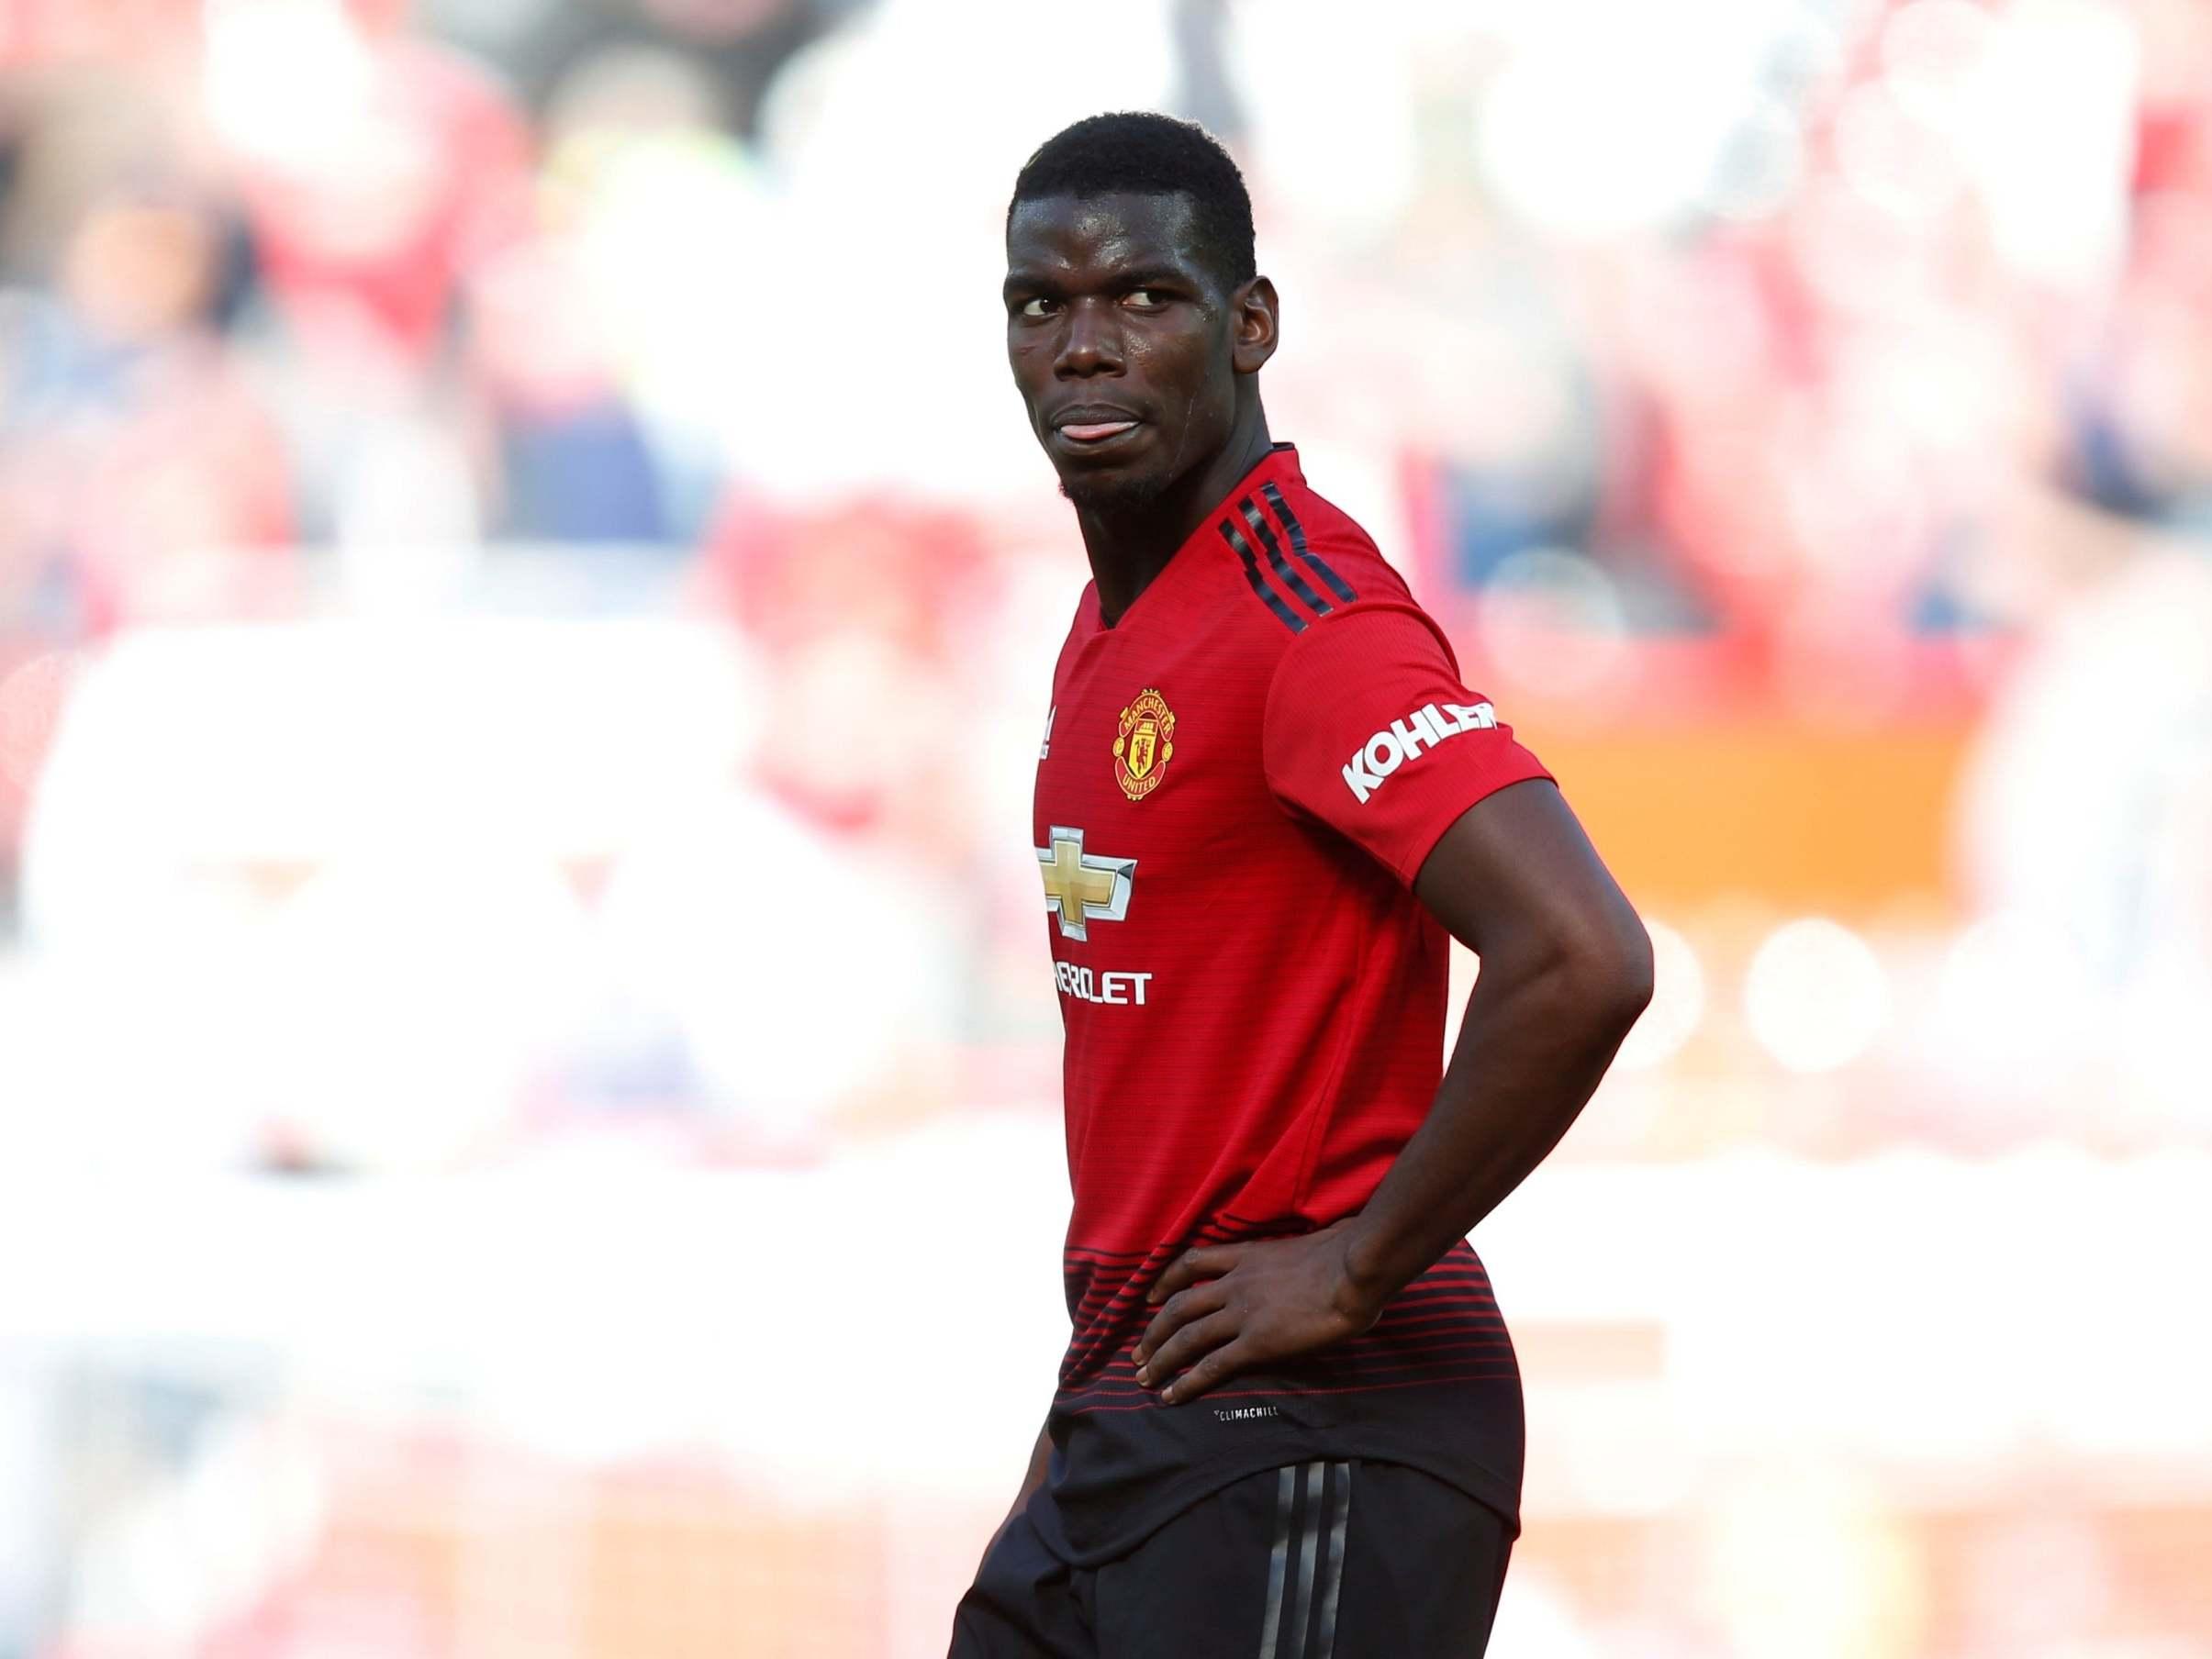 Manchester United transfer news: Tottenham's Christian Eriksen lined up should Paul Pogba leave